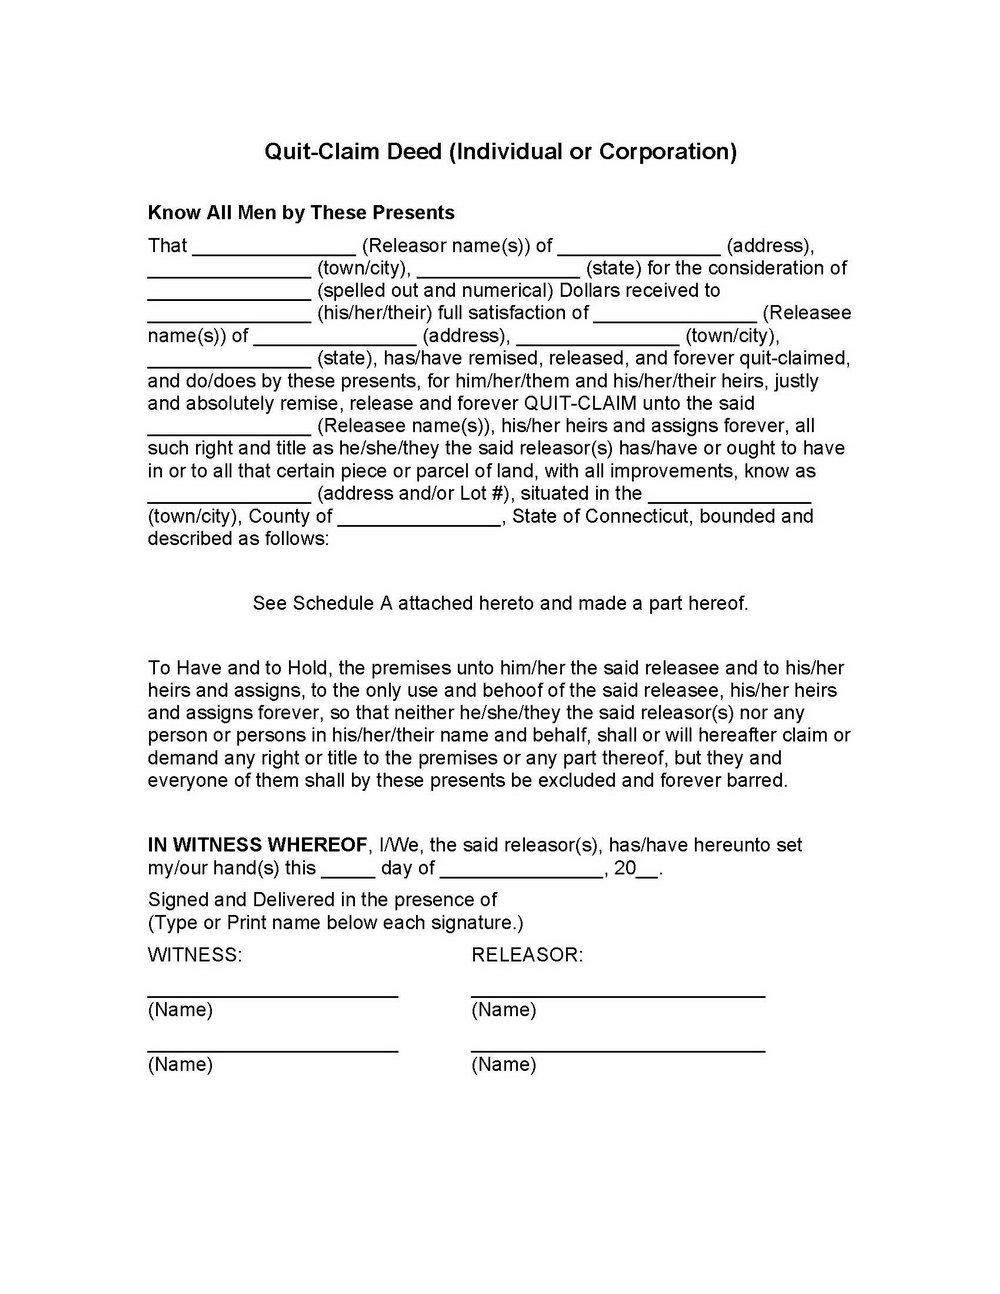 Quit Claim Deed Form Douglas County Georgia